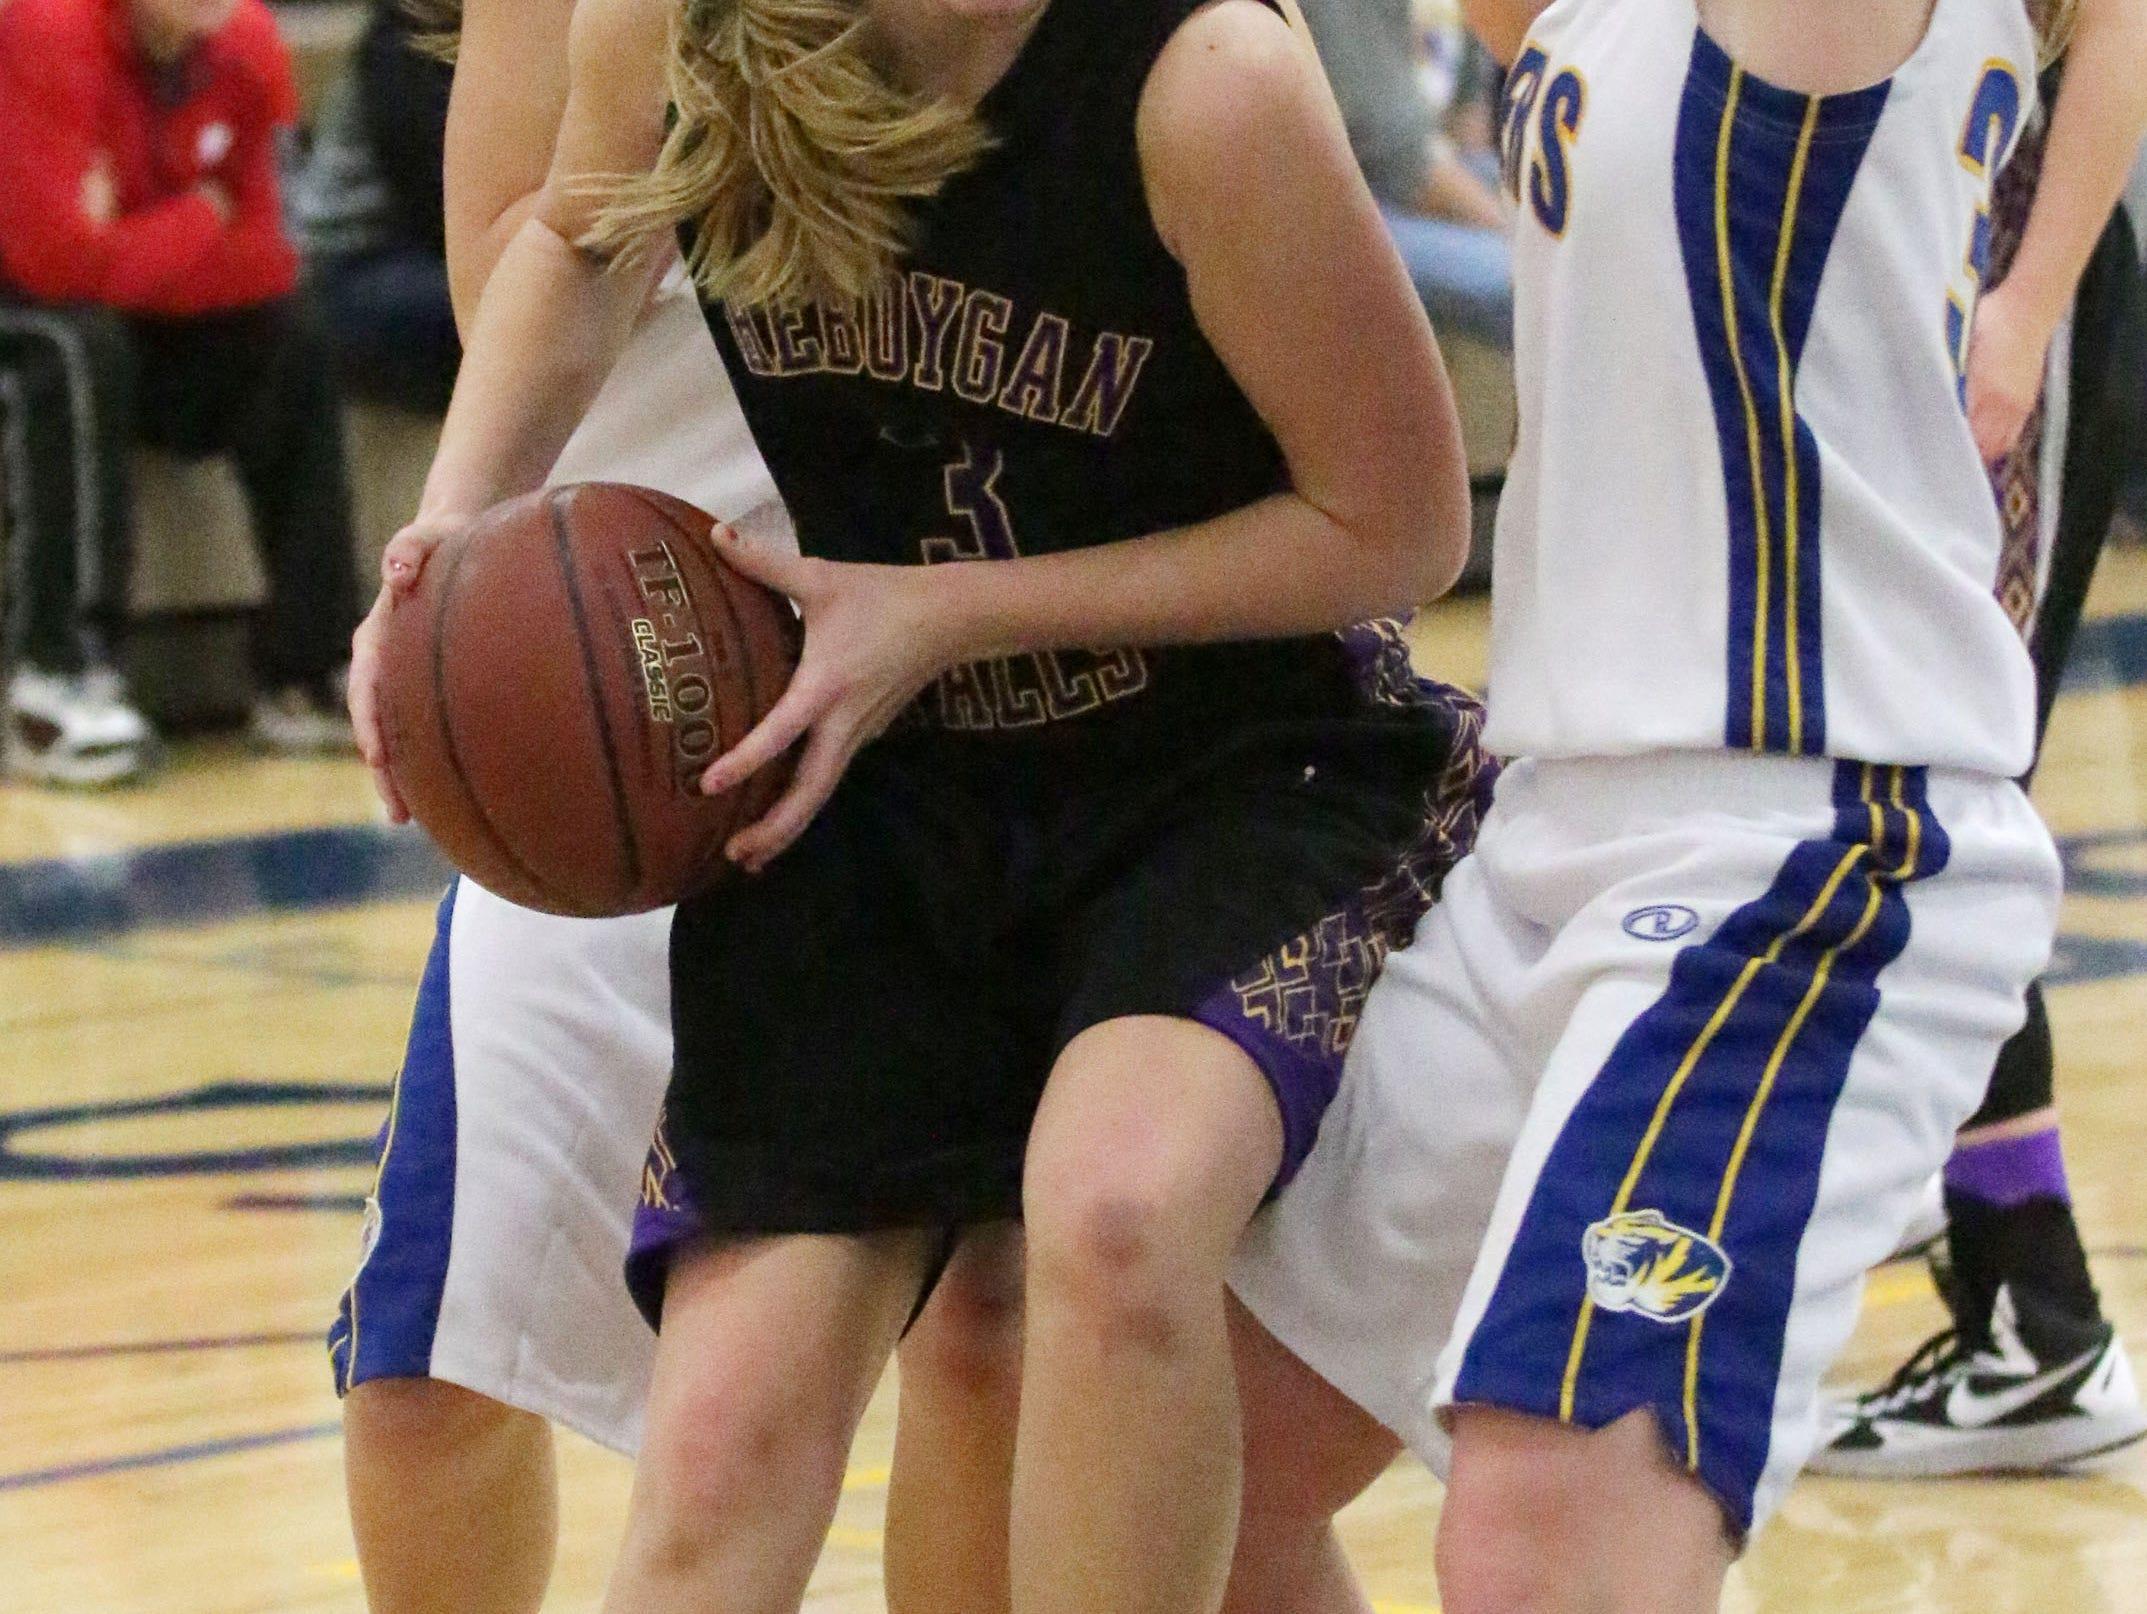 Senior Erika Van Engen was a first-team all-EWC selection last season.